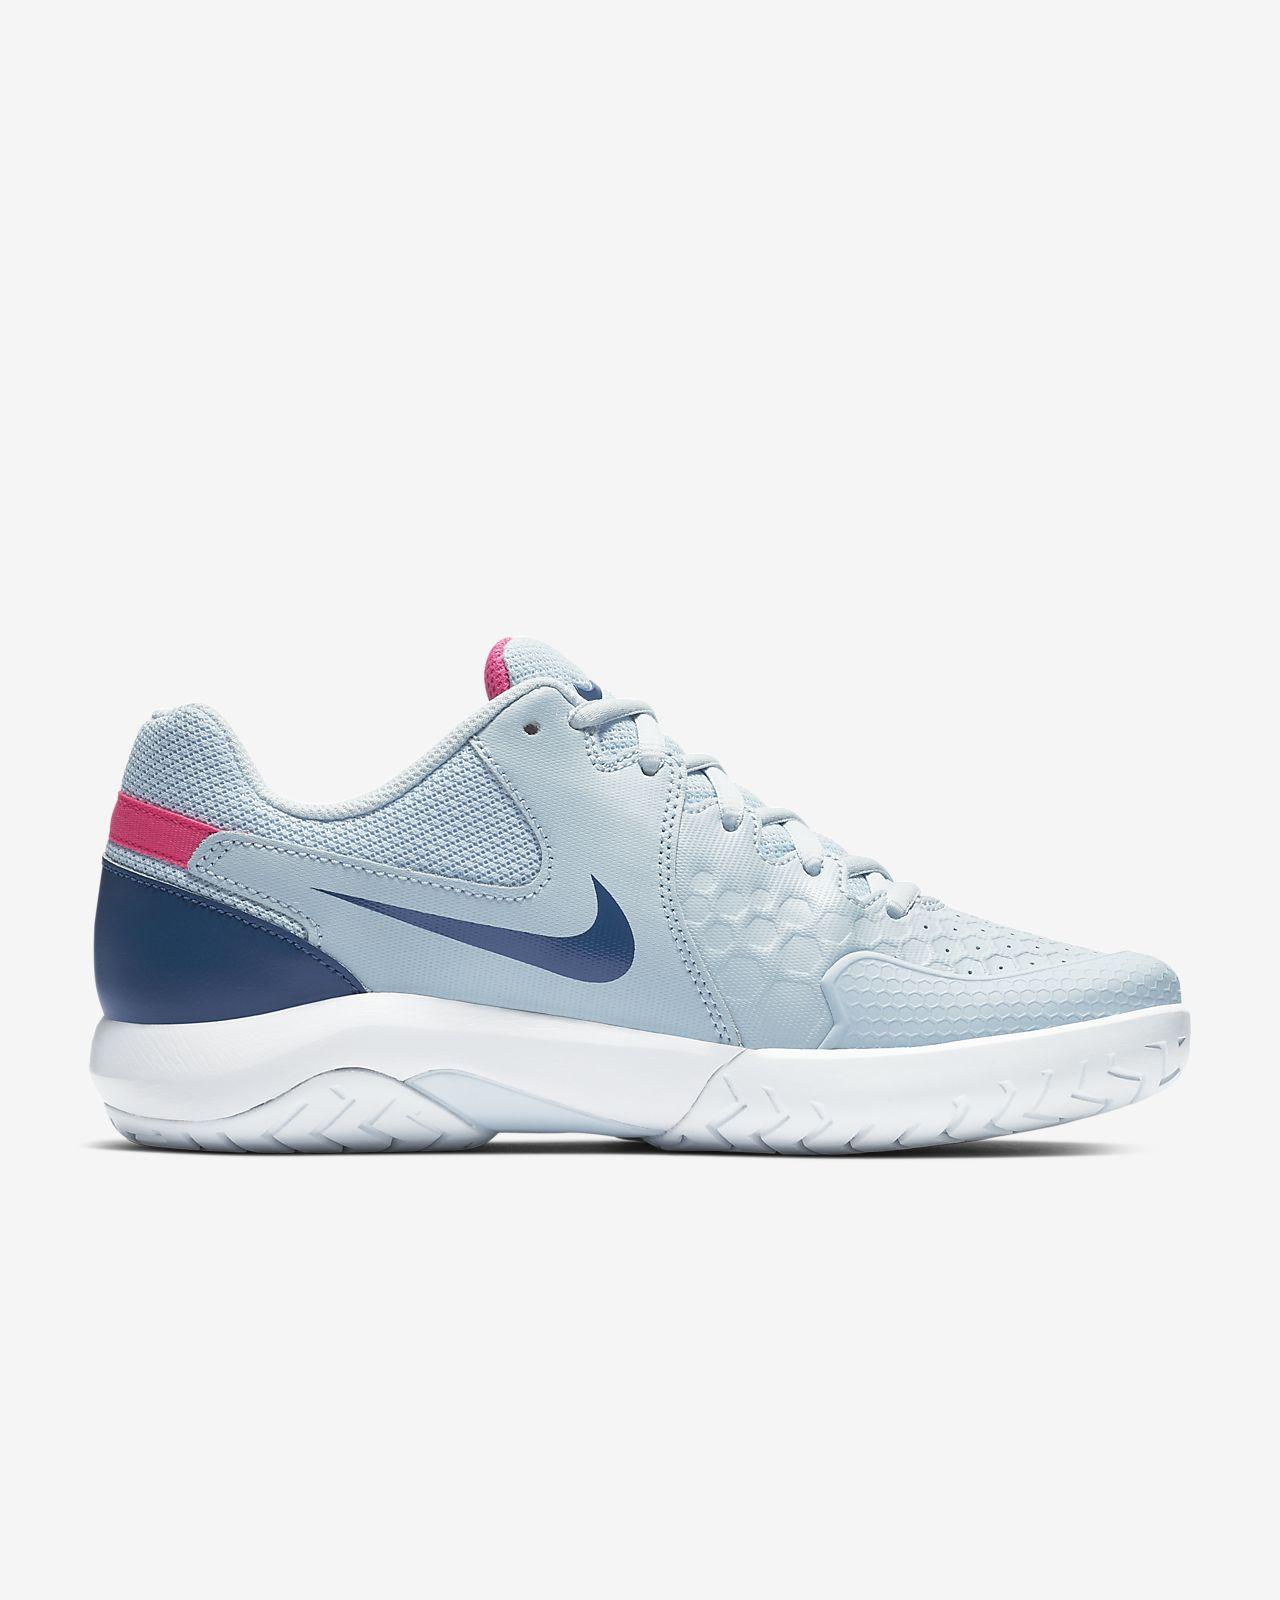 5084440034a NikeCourt Air Zoom Resistance Women's Hard Court Tennis Shoe